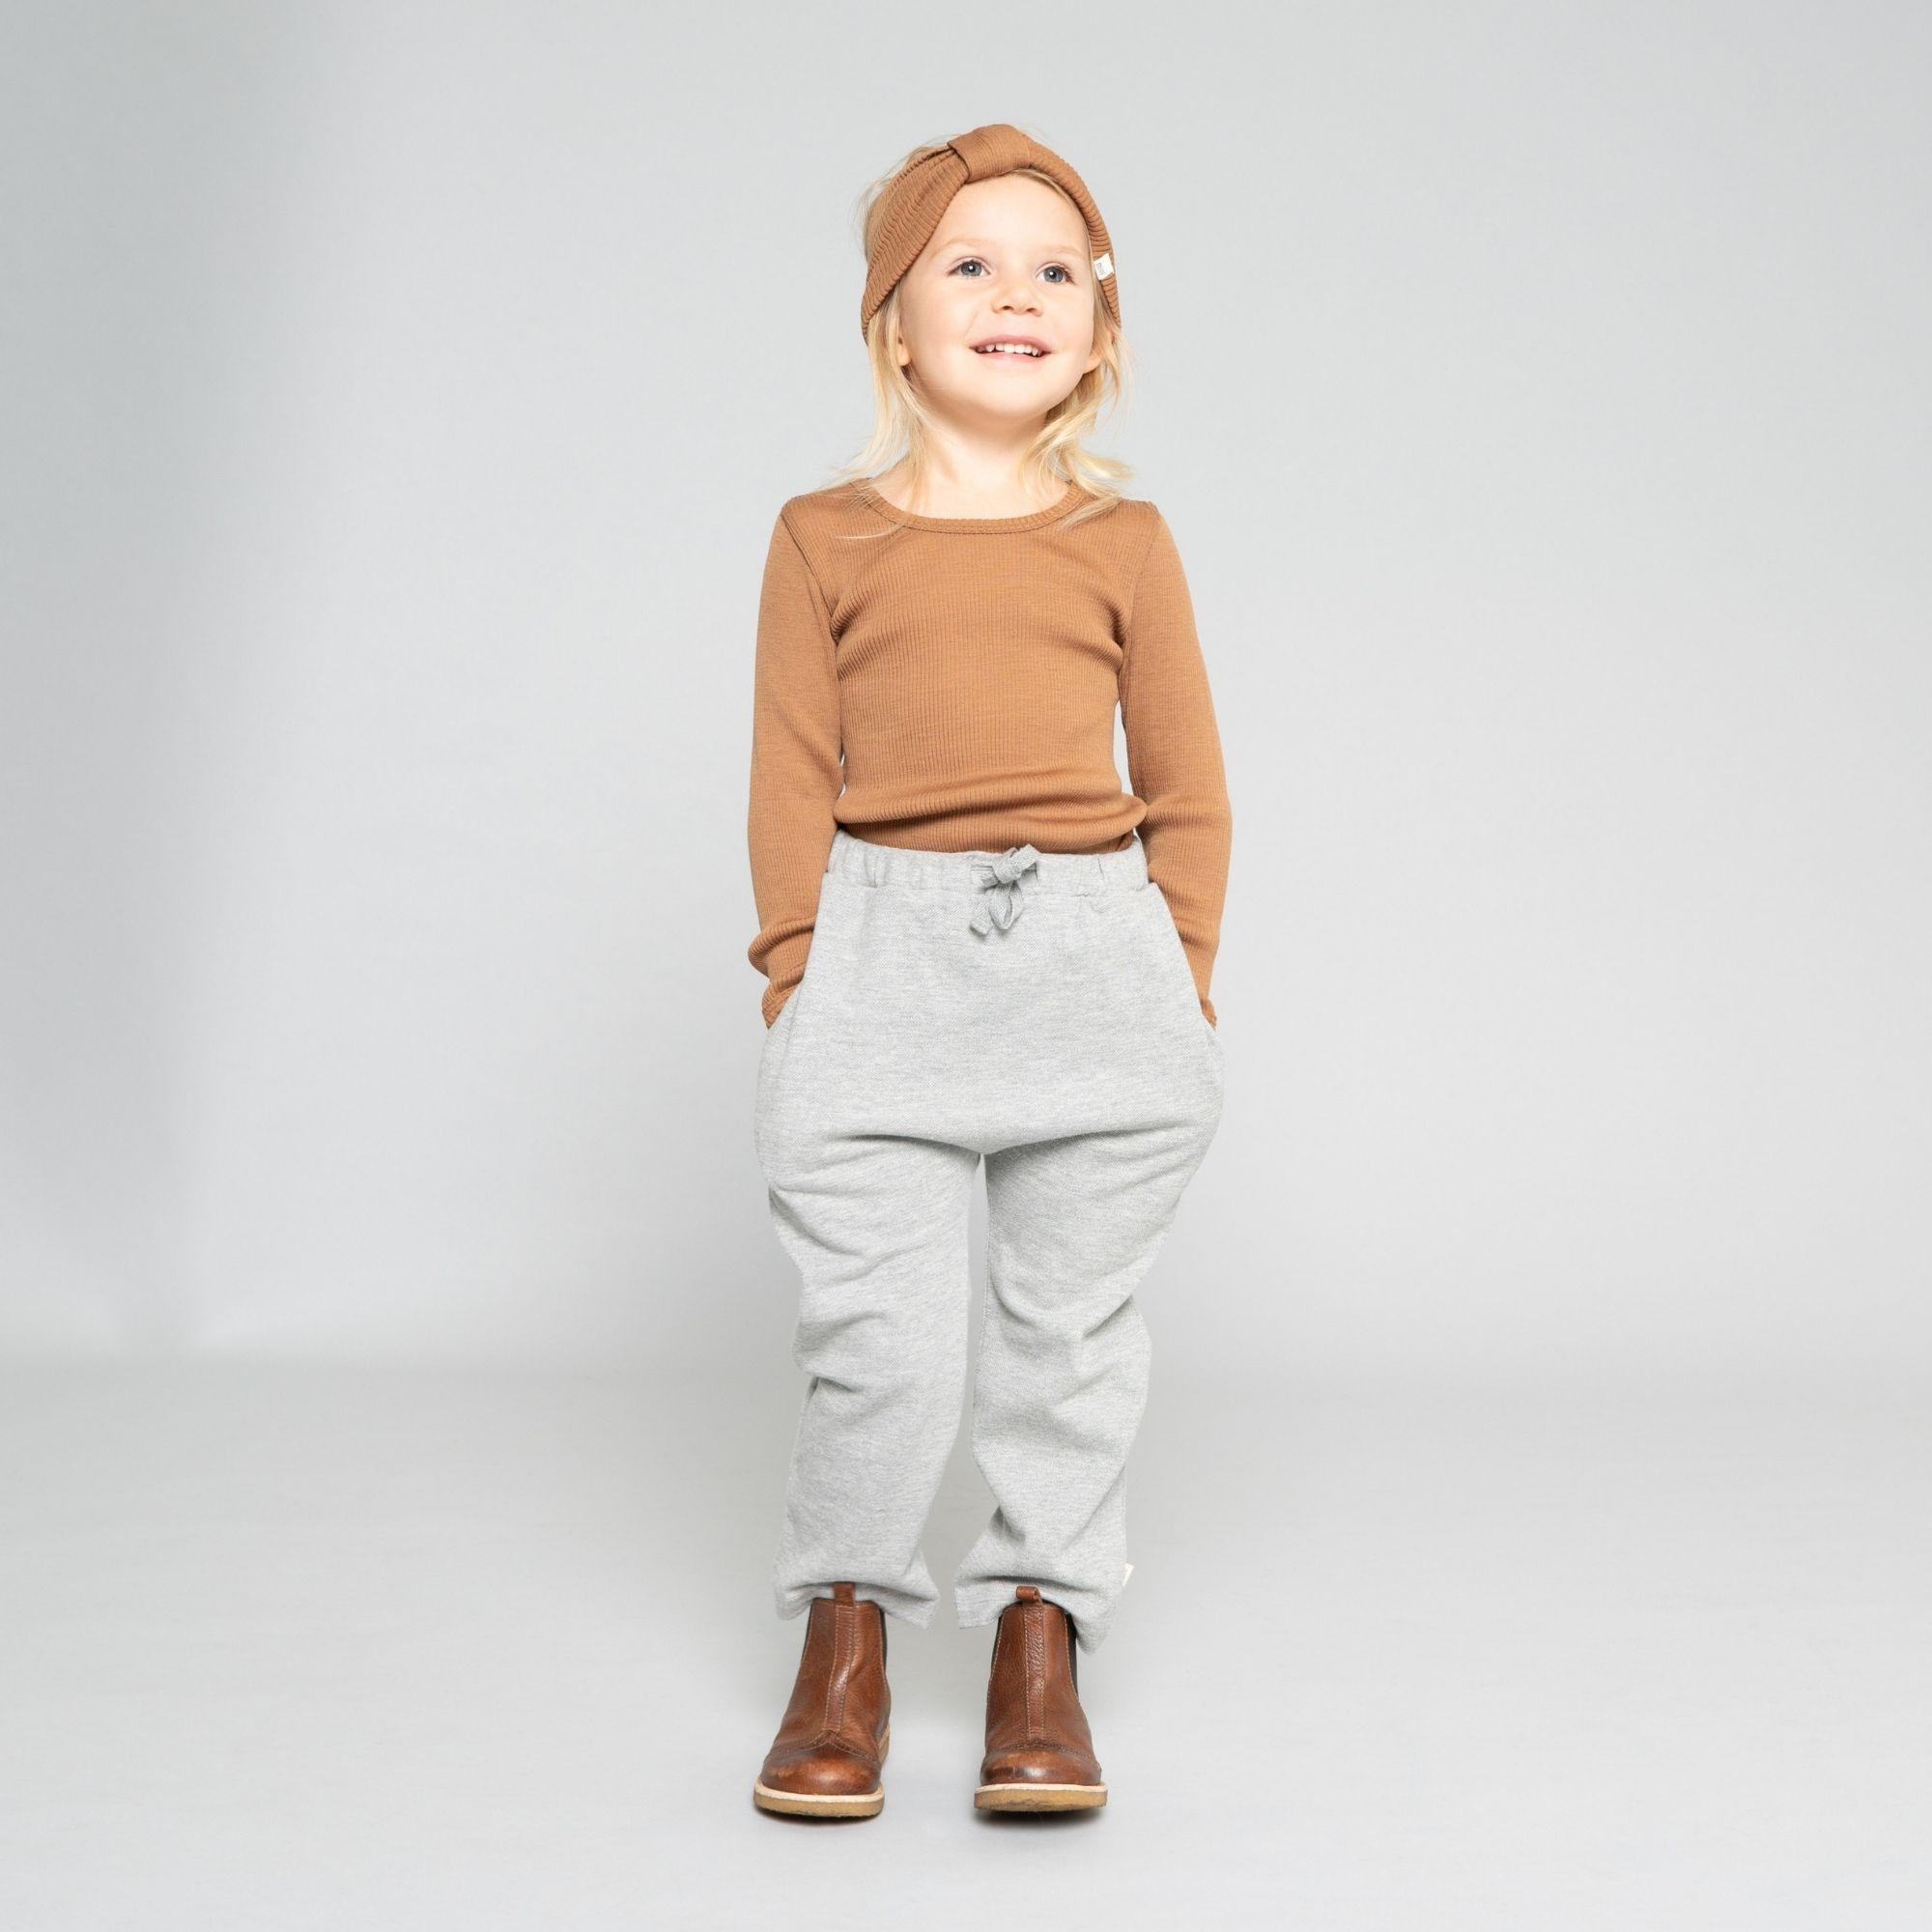 MINIMALISMA - T-shirt enfant - 100 % laine mérinos - Caramel